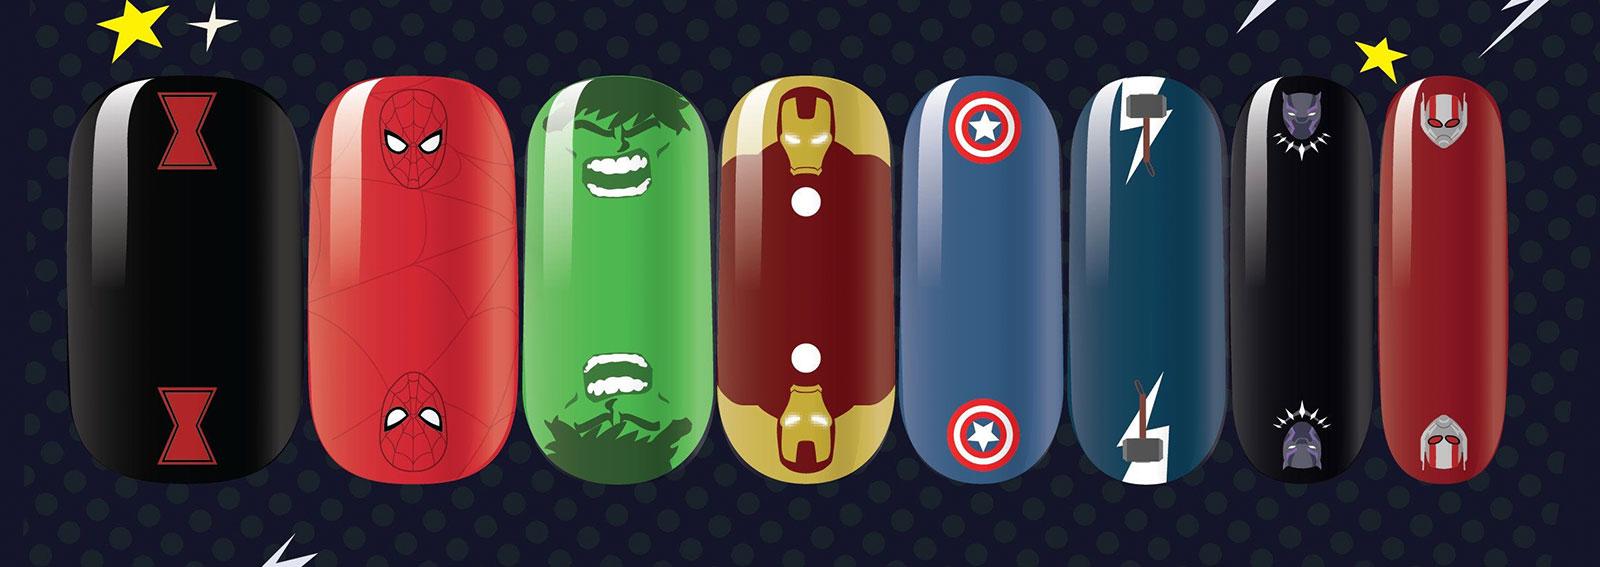 nail-art-avengers-dekstop